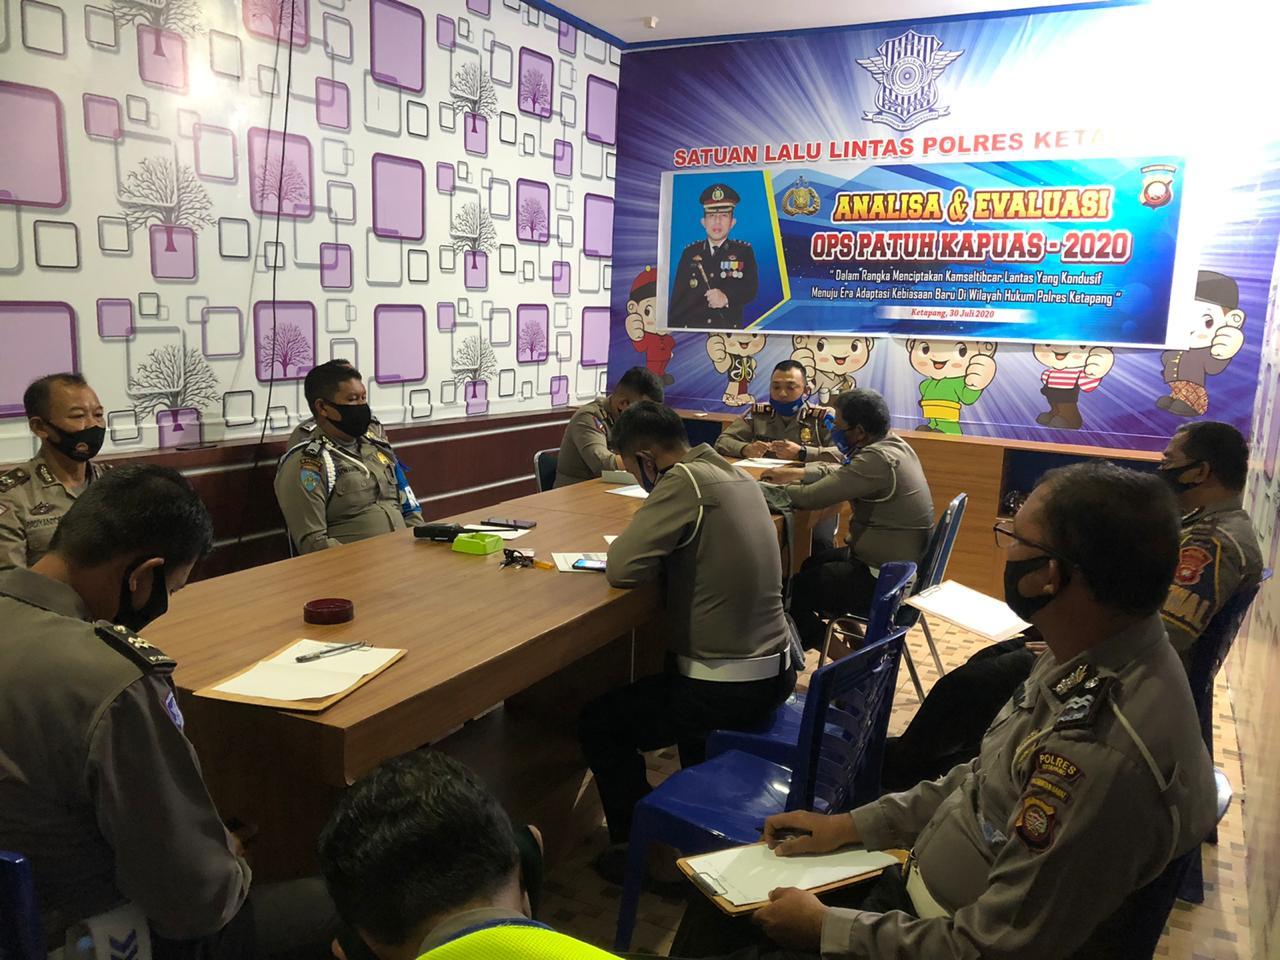 Kasat Lantas Polres Ketapang Pimpin Anev Ops Patuh Kapuas2020